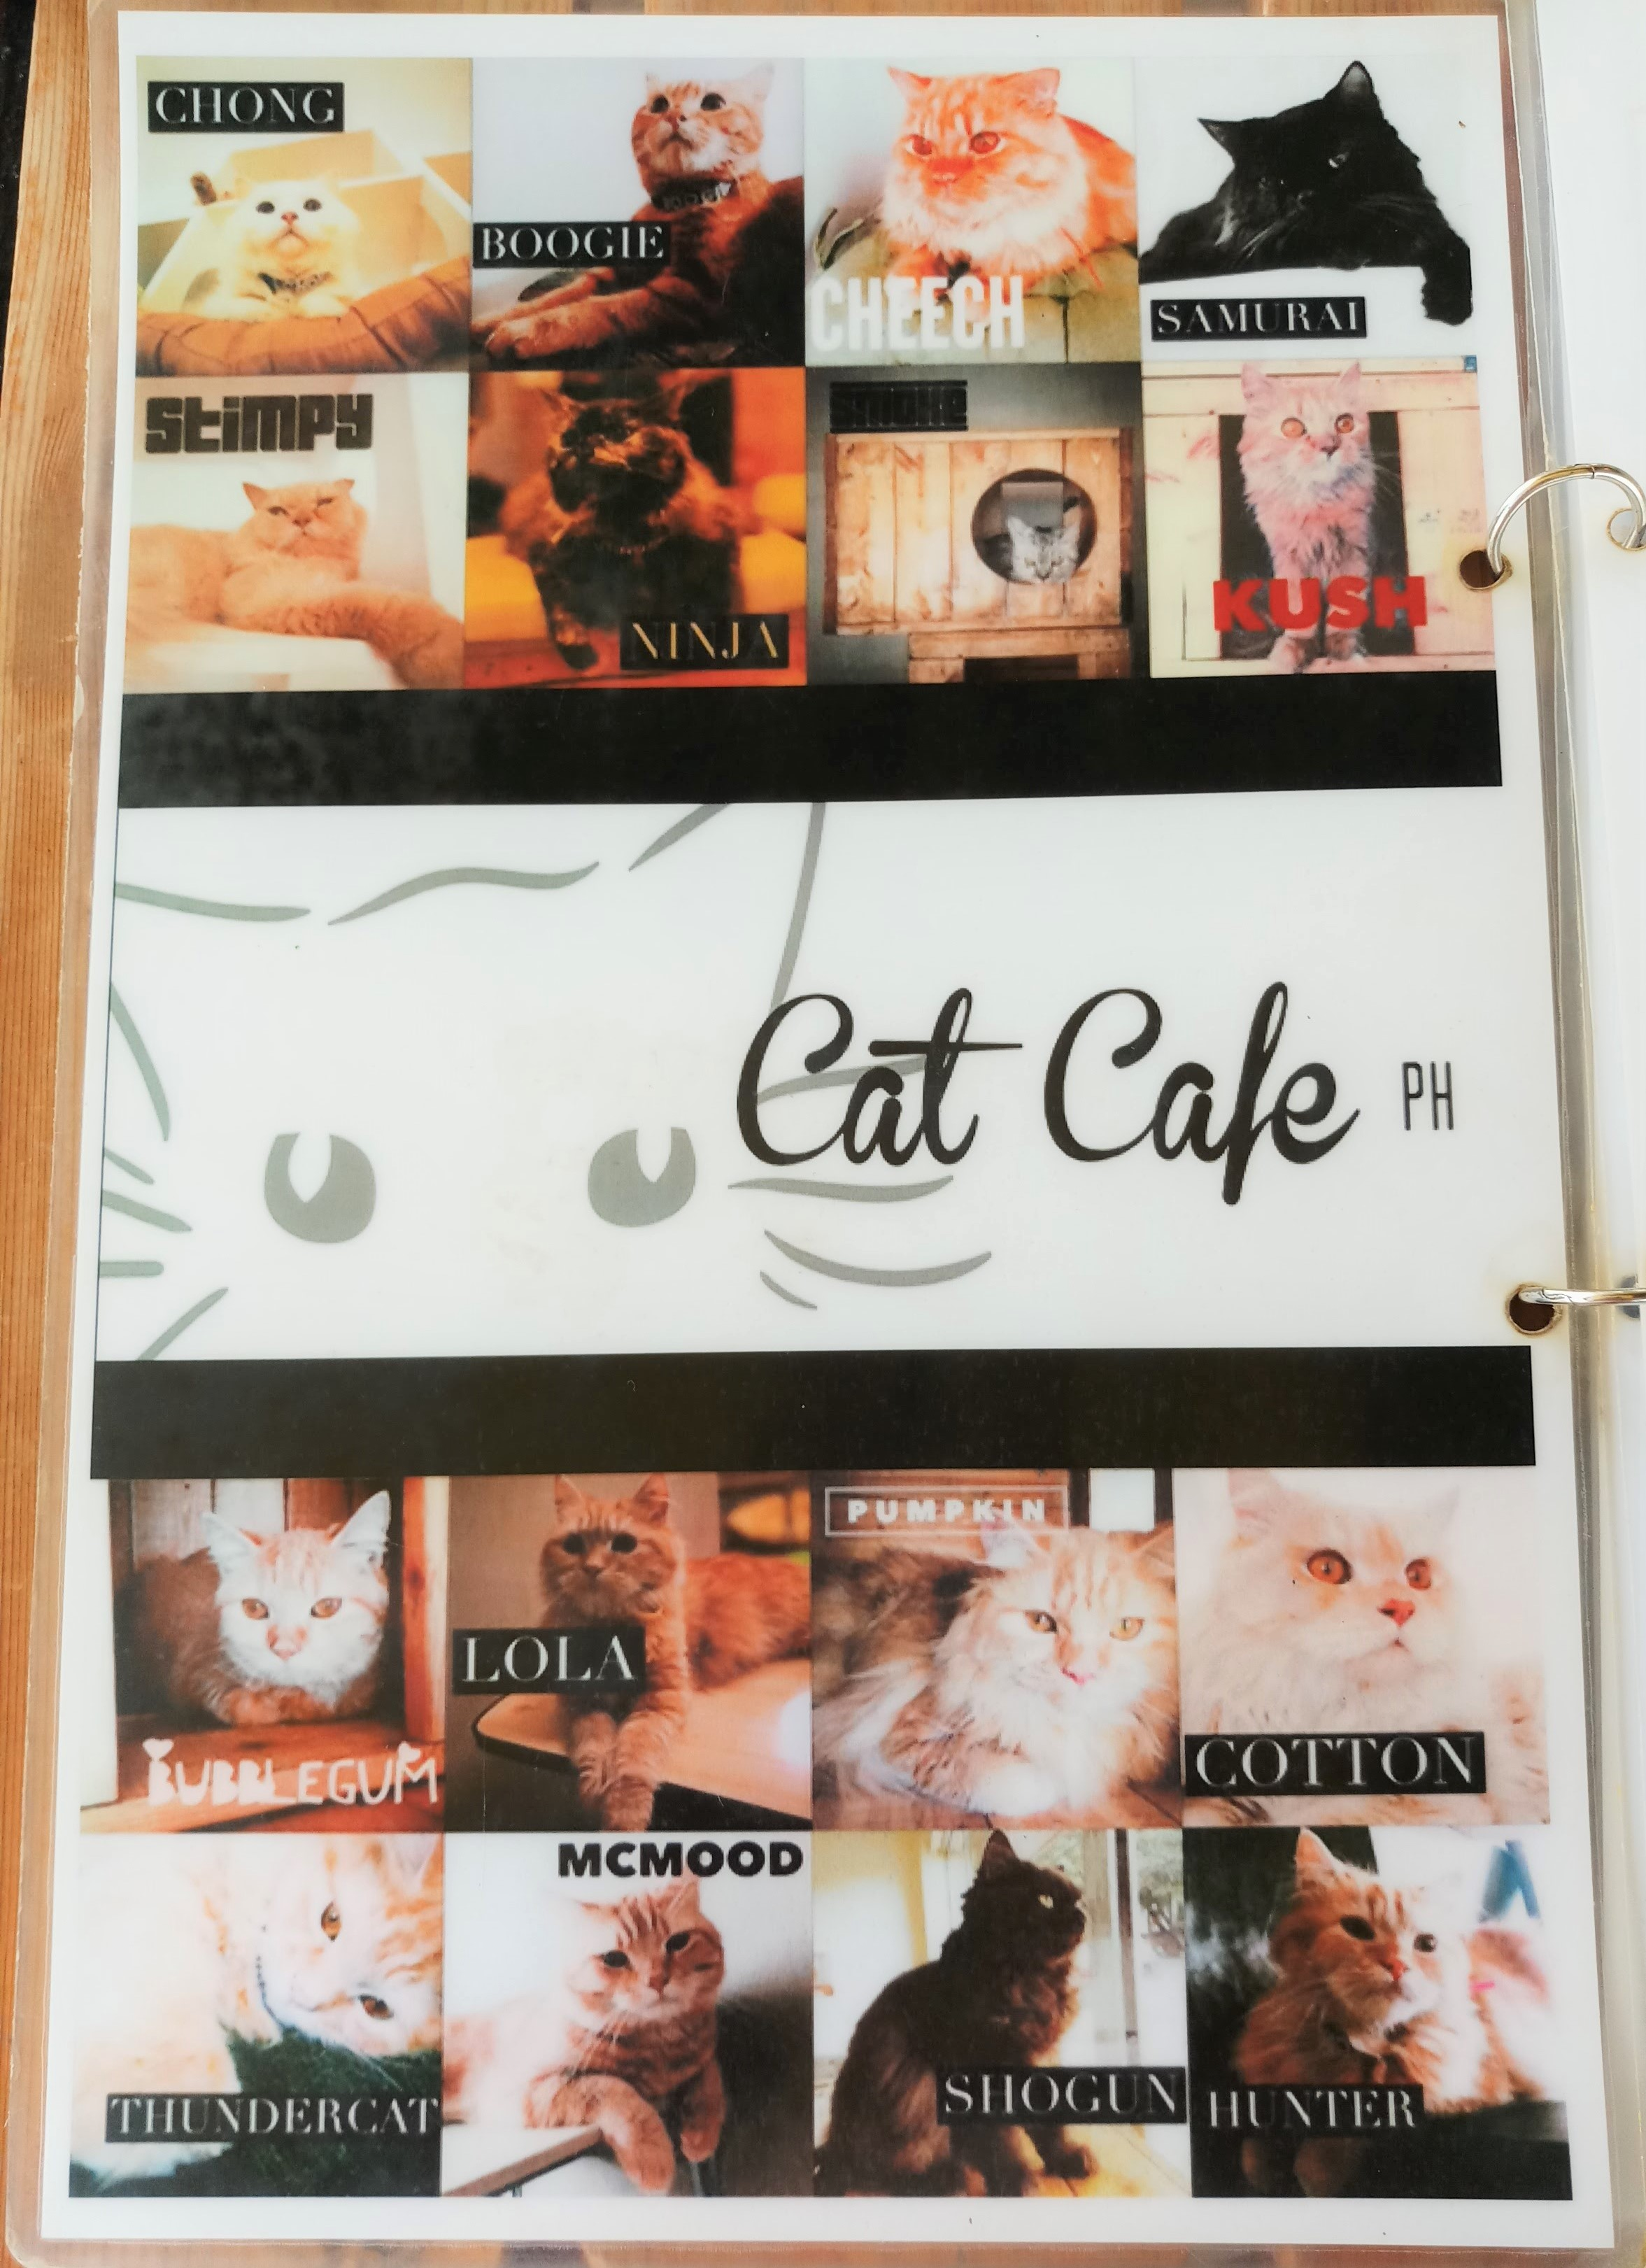 Cat Cafe Cebu - Cat names